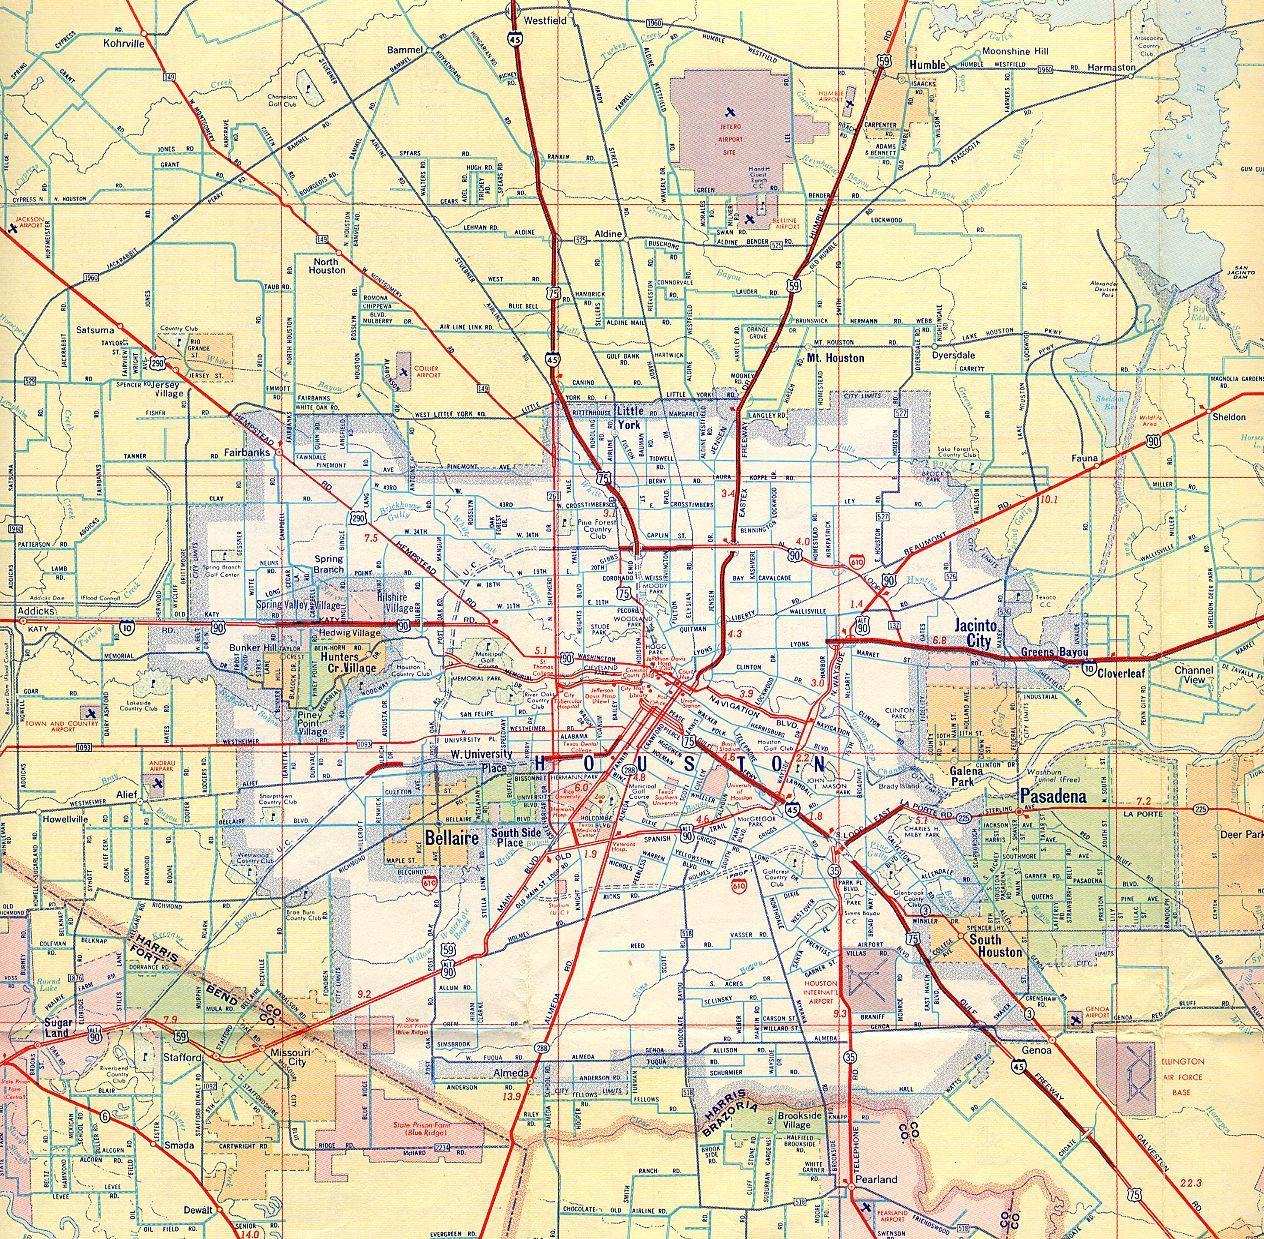 Houston Road Map Road Map Of Houston Texas USA - Texas usa map